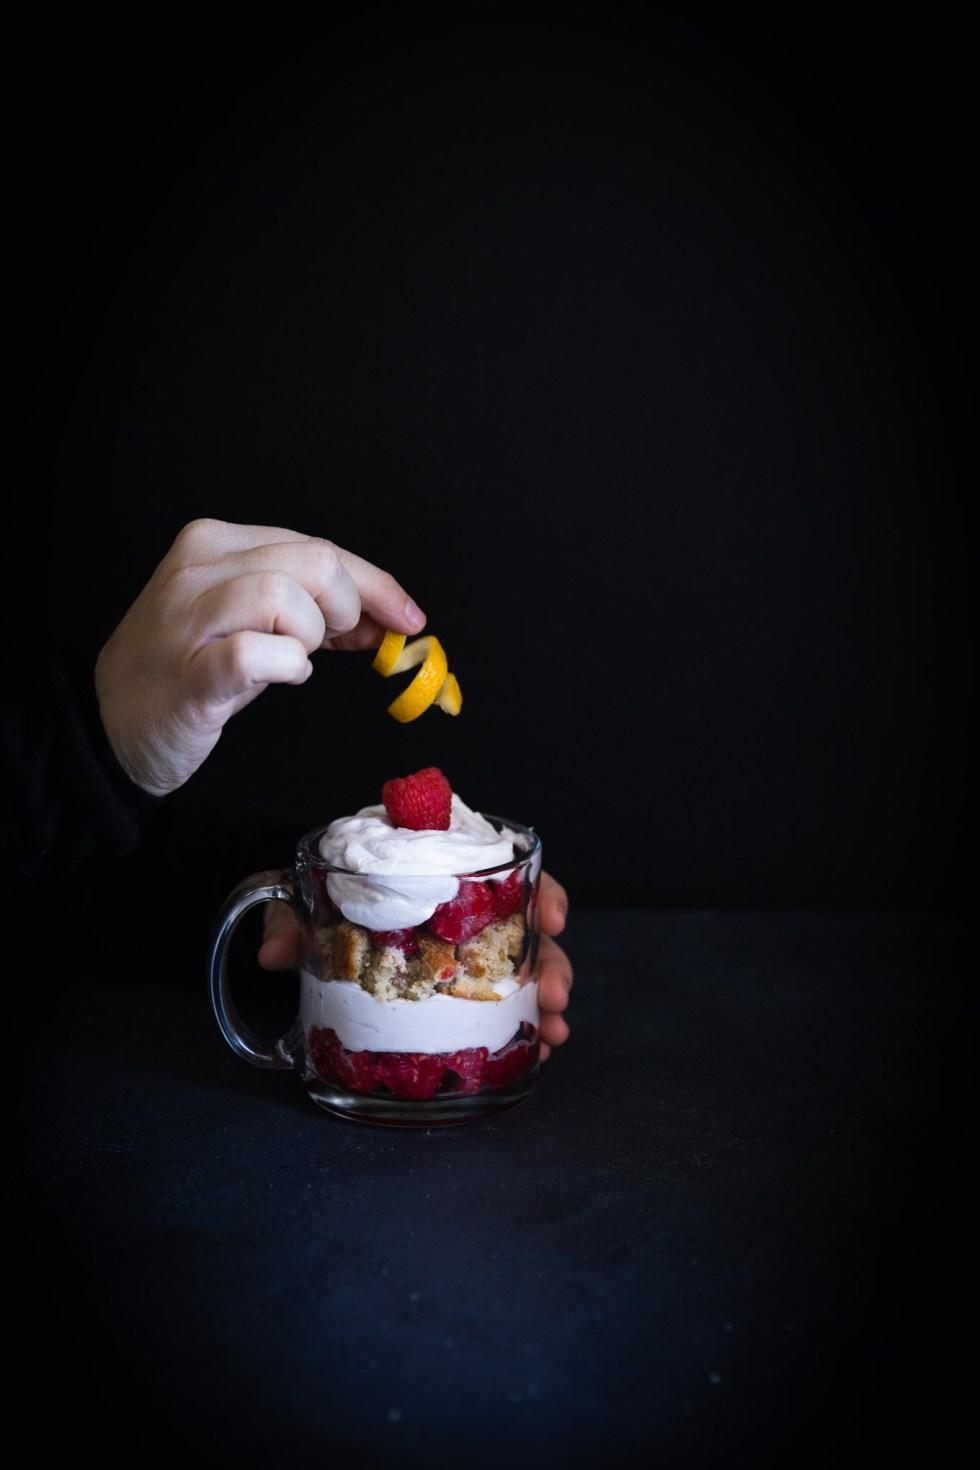 Garnishing a Raspberry Lemon Cake Trifle with a Lemon Peel Twist